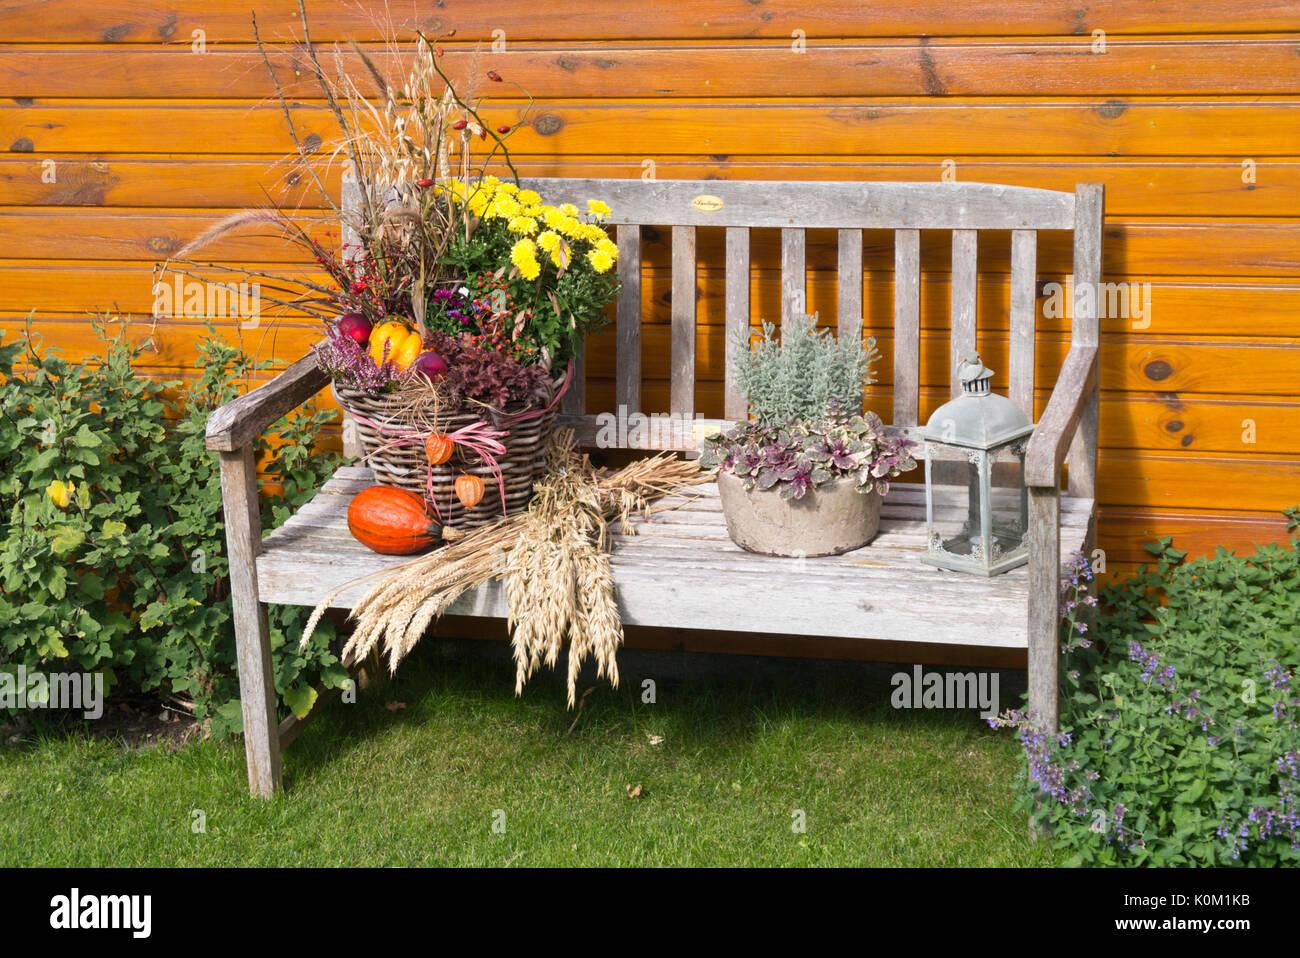 Garden Bench With Autumn Decoration Stock Photo Alamy